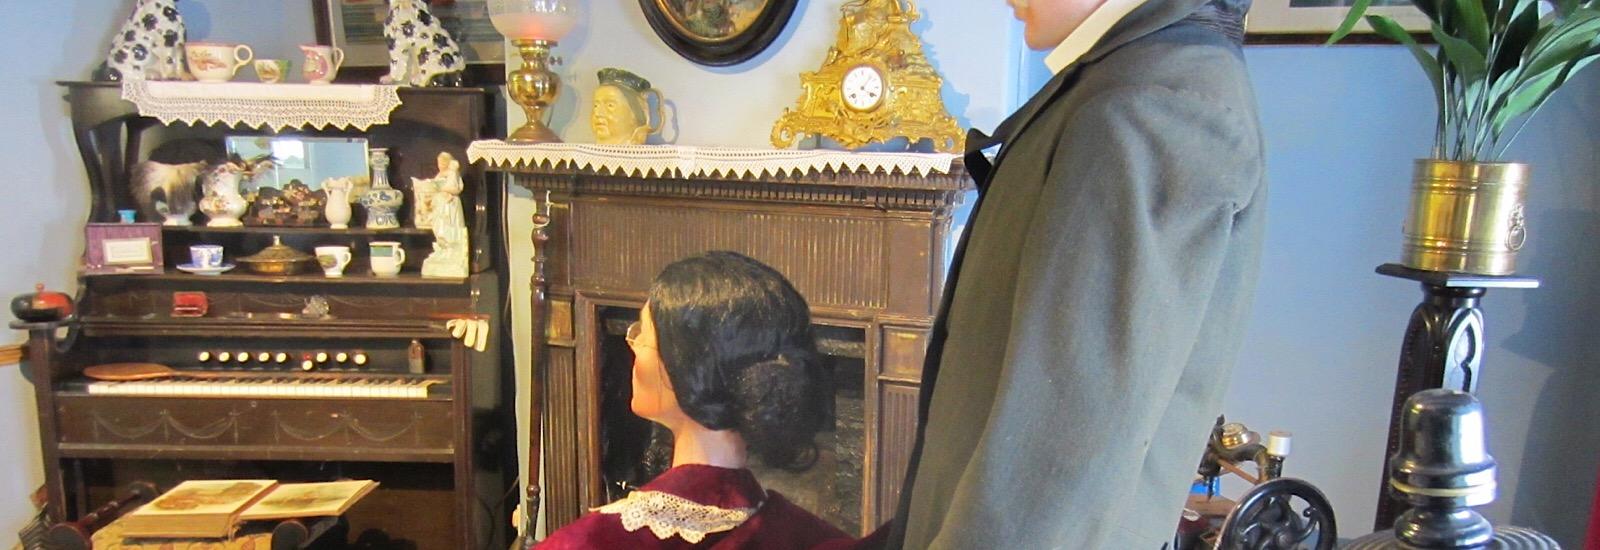 Victorian Room Filey Museum